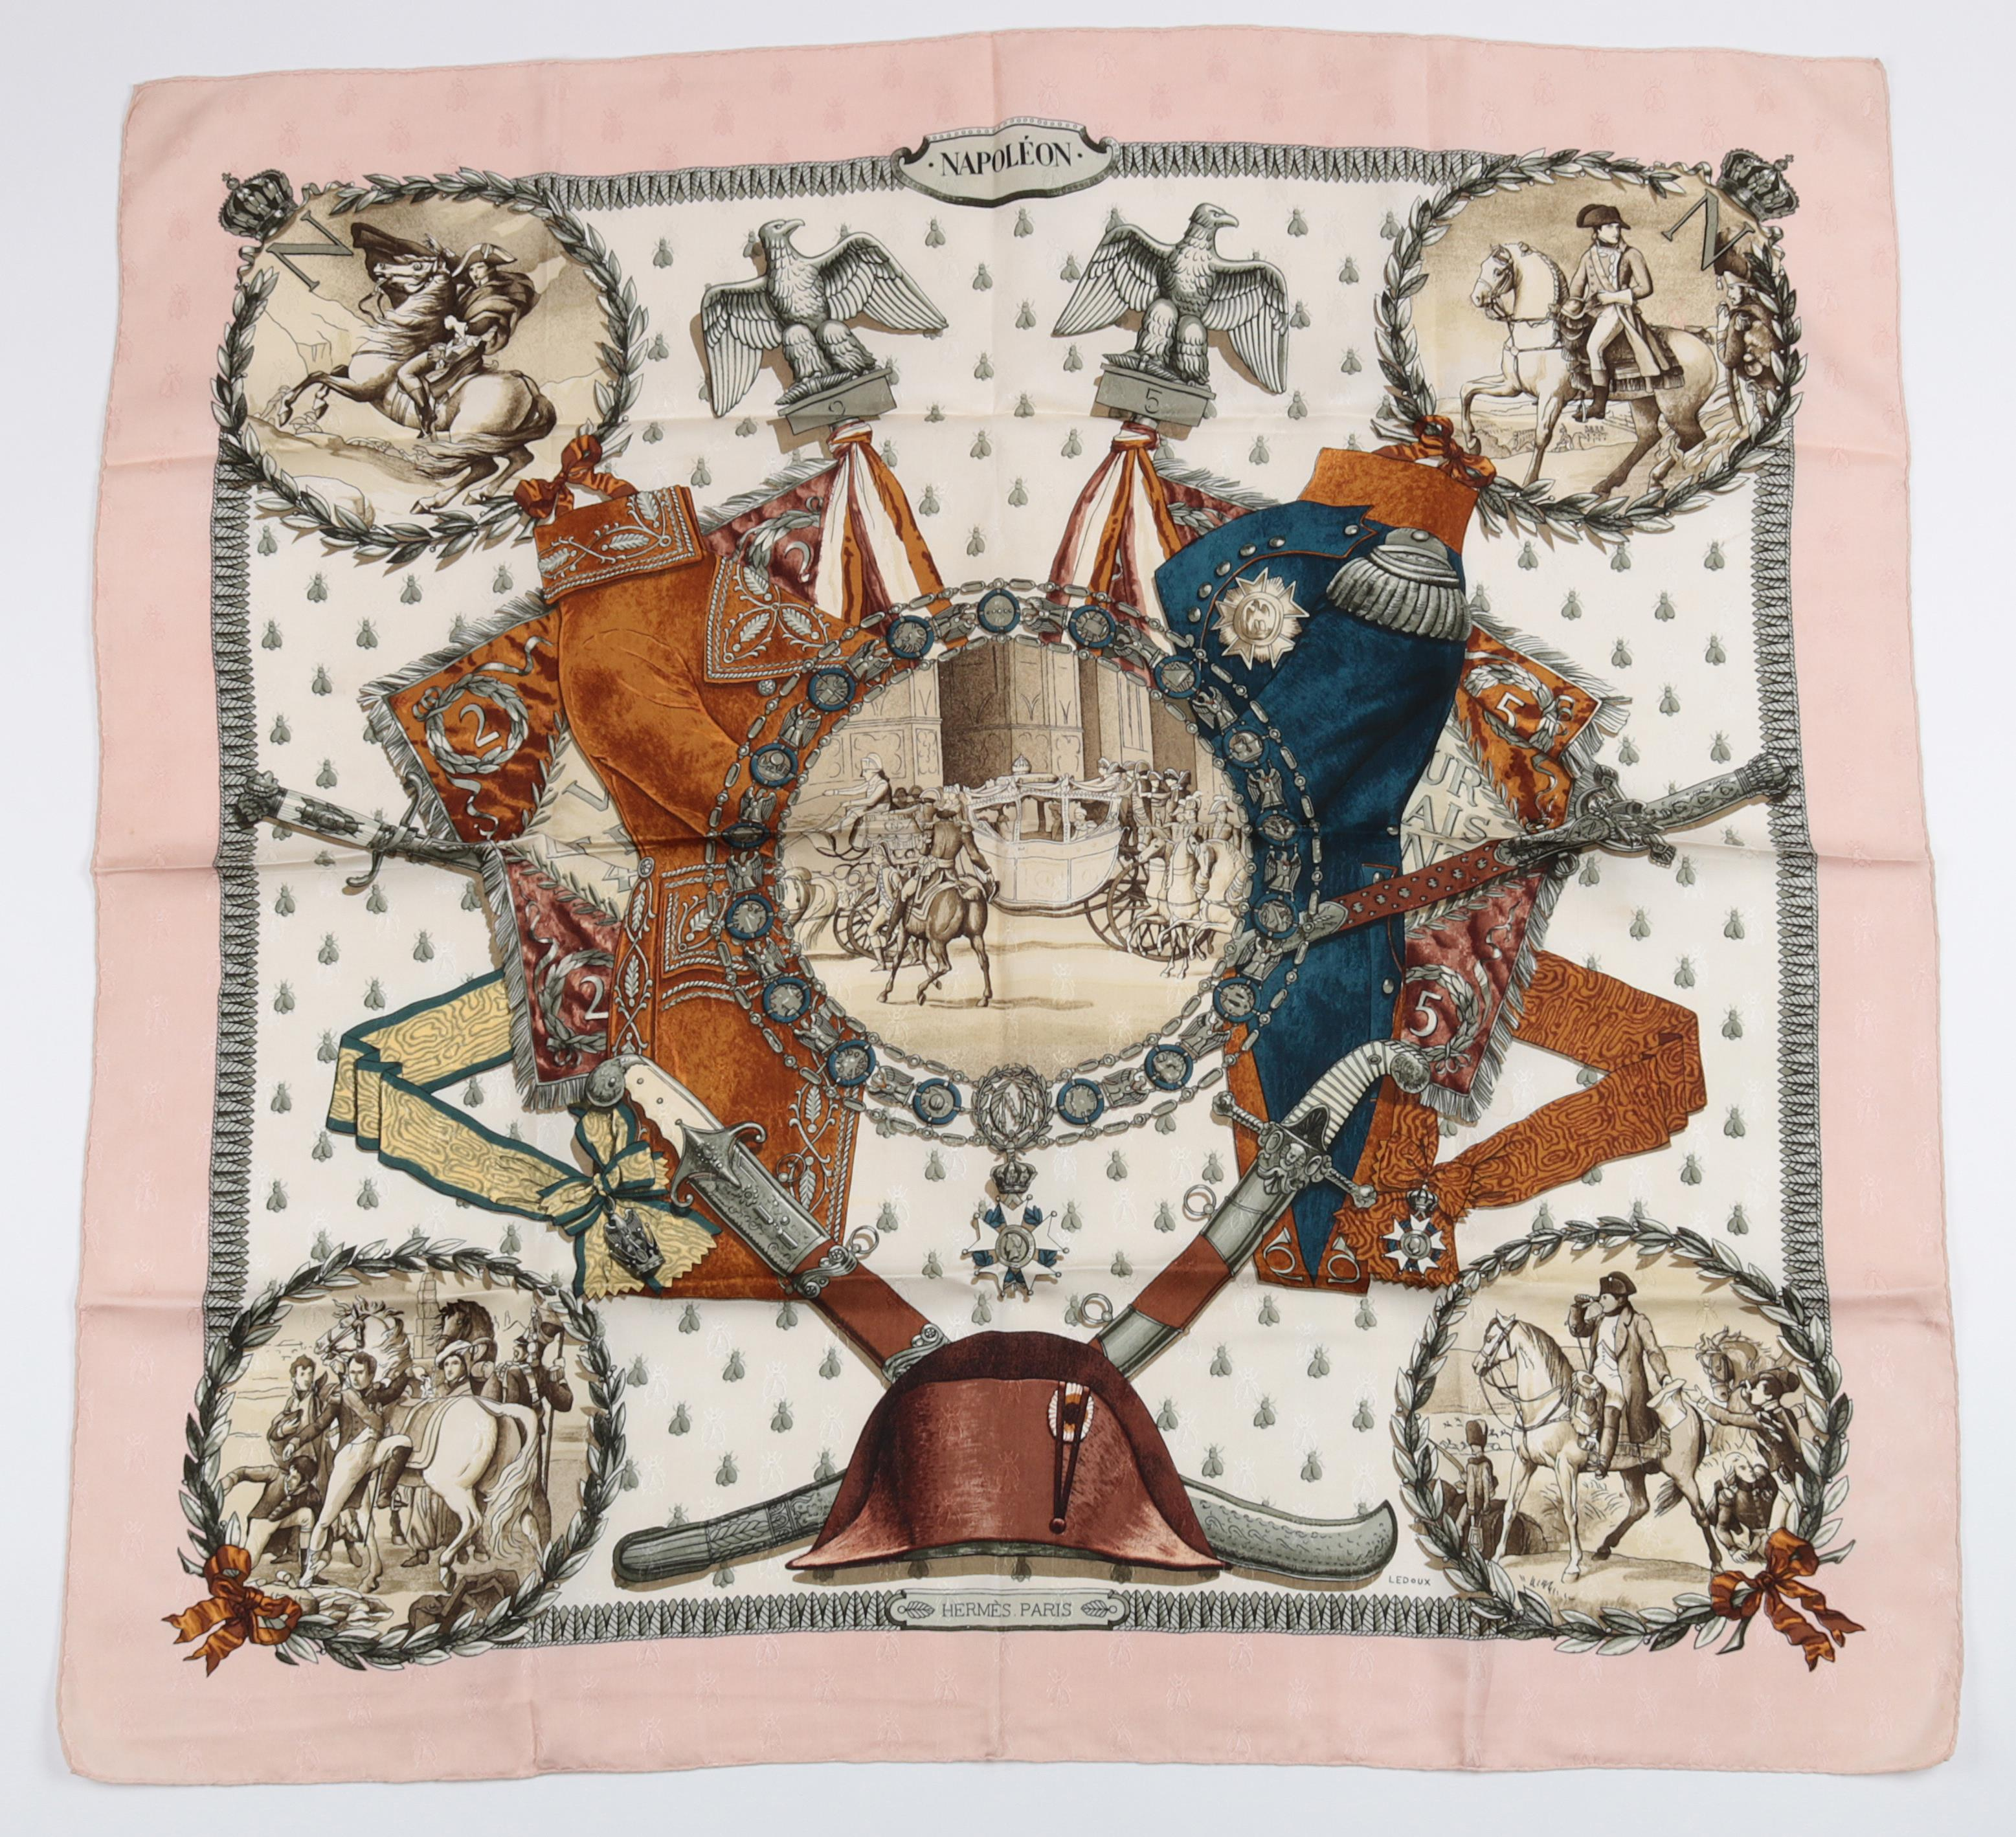 Hermès scarf 'Napoléon', designed by Philippe Ledoux in 1963, silk, approx. 89 x 89 cm, starting bid €180